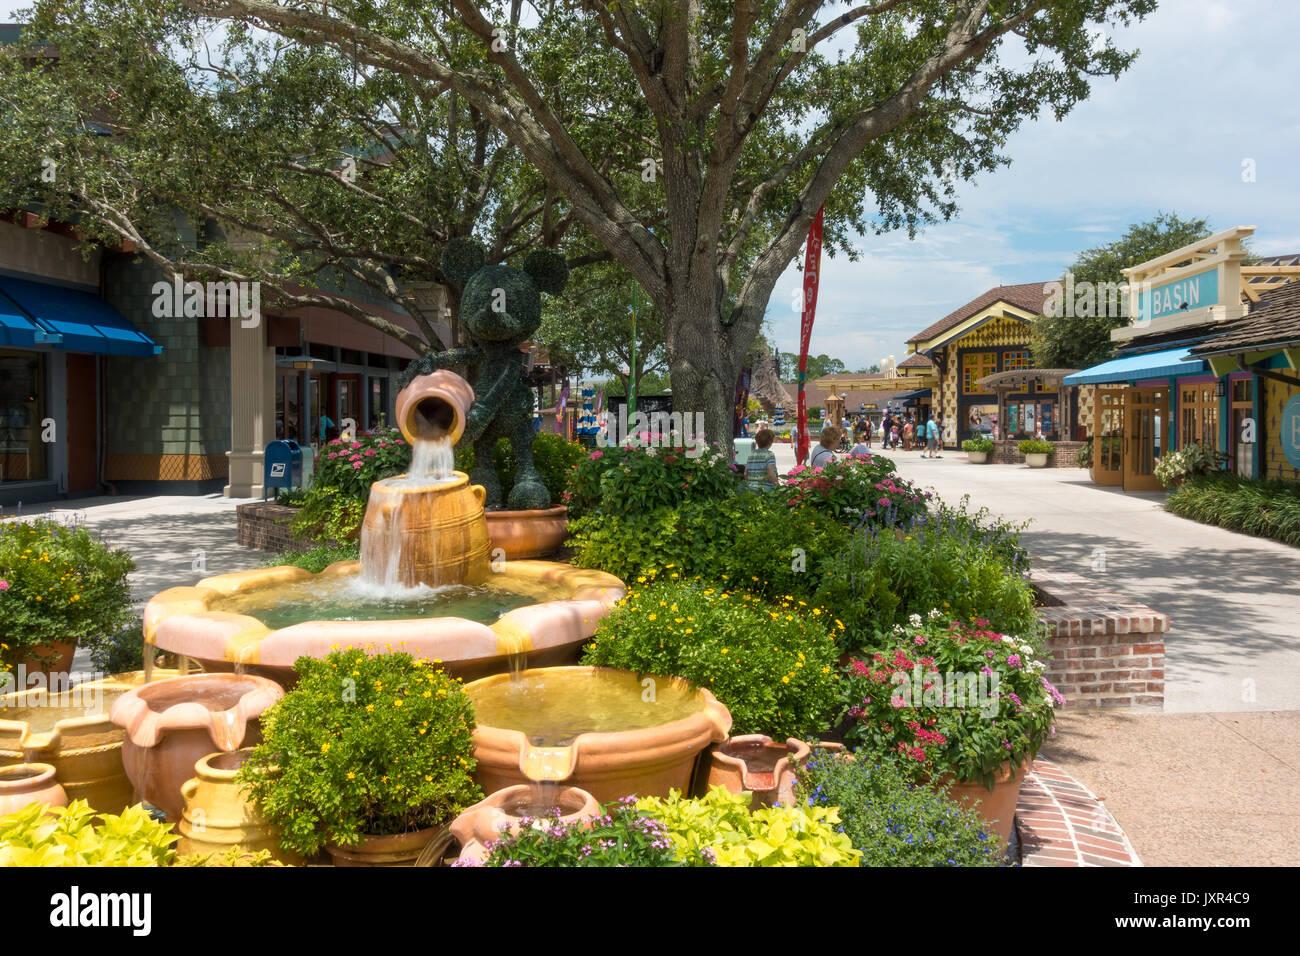 Mickey and the Clay pots Fountain at Disney Springs, Walt Disney World, Orlando, Florida. - Stock Image